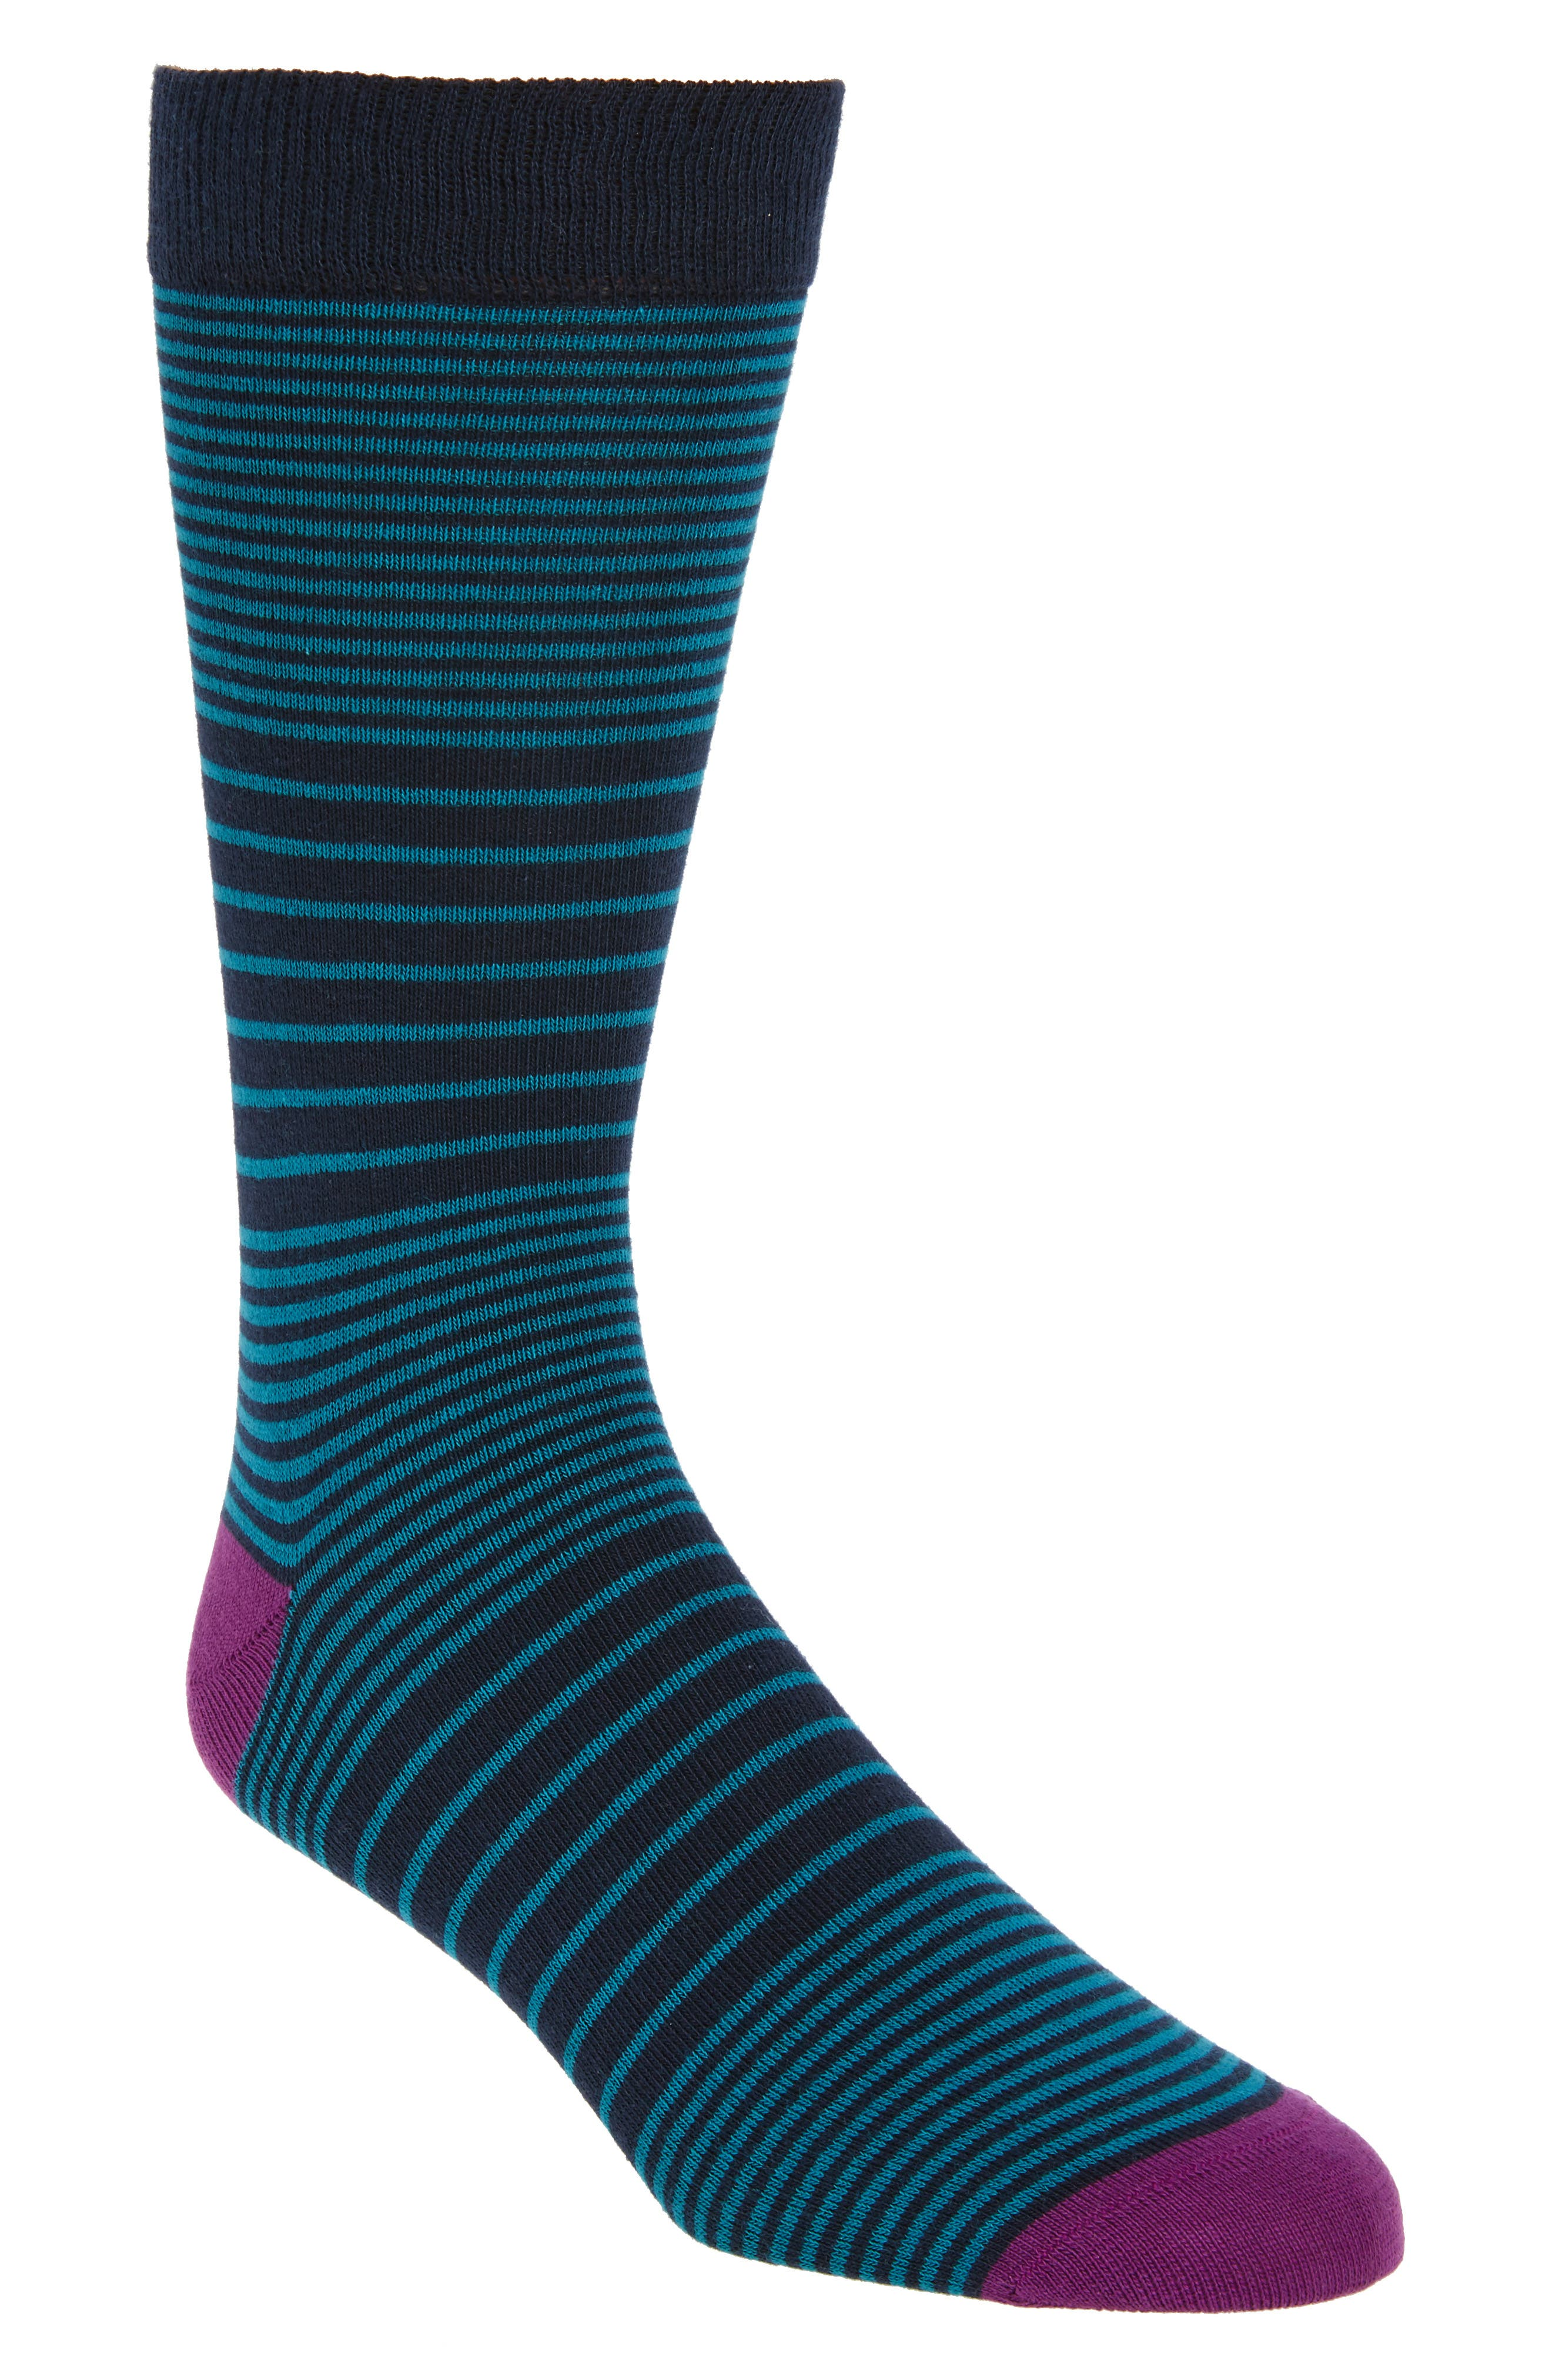 Multi Stripe Socks,                             Main thumbnail 1, color,                             Teal/ Navy